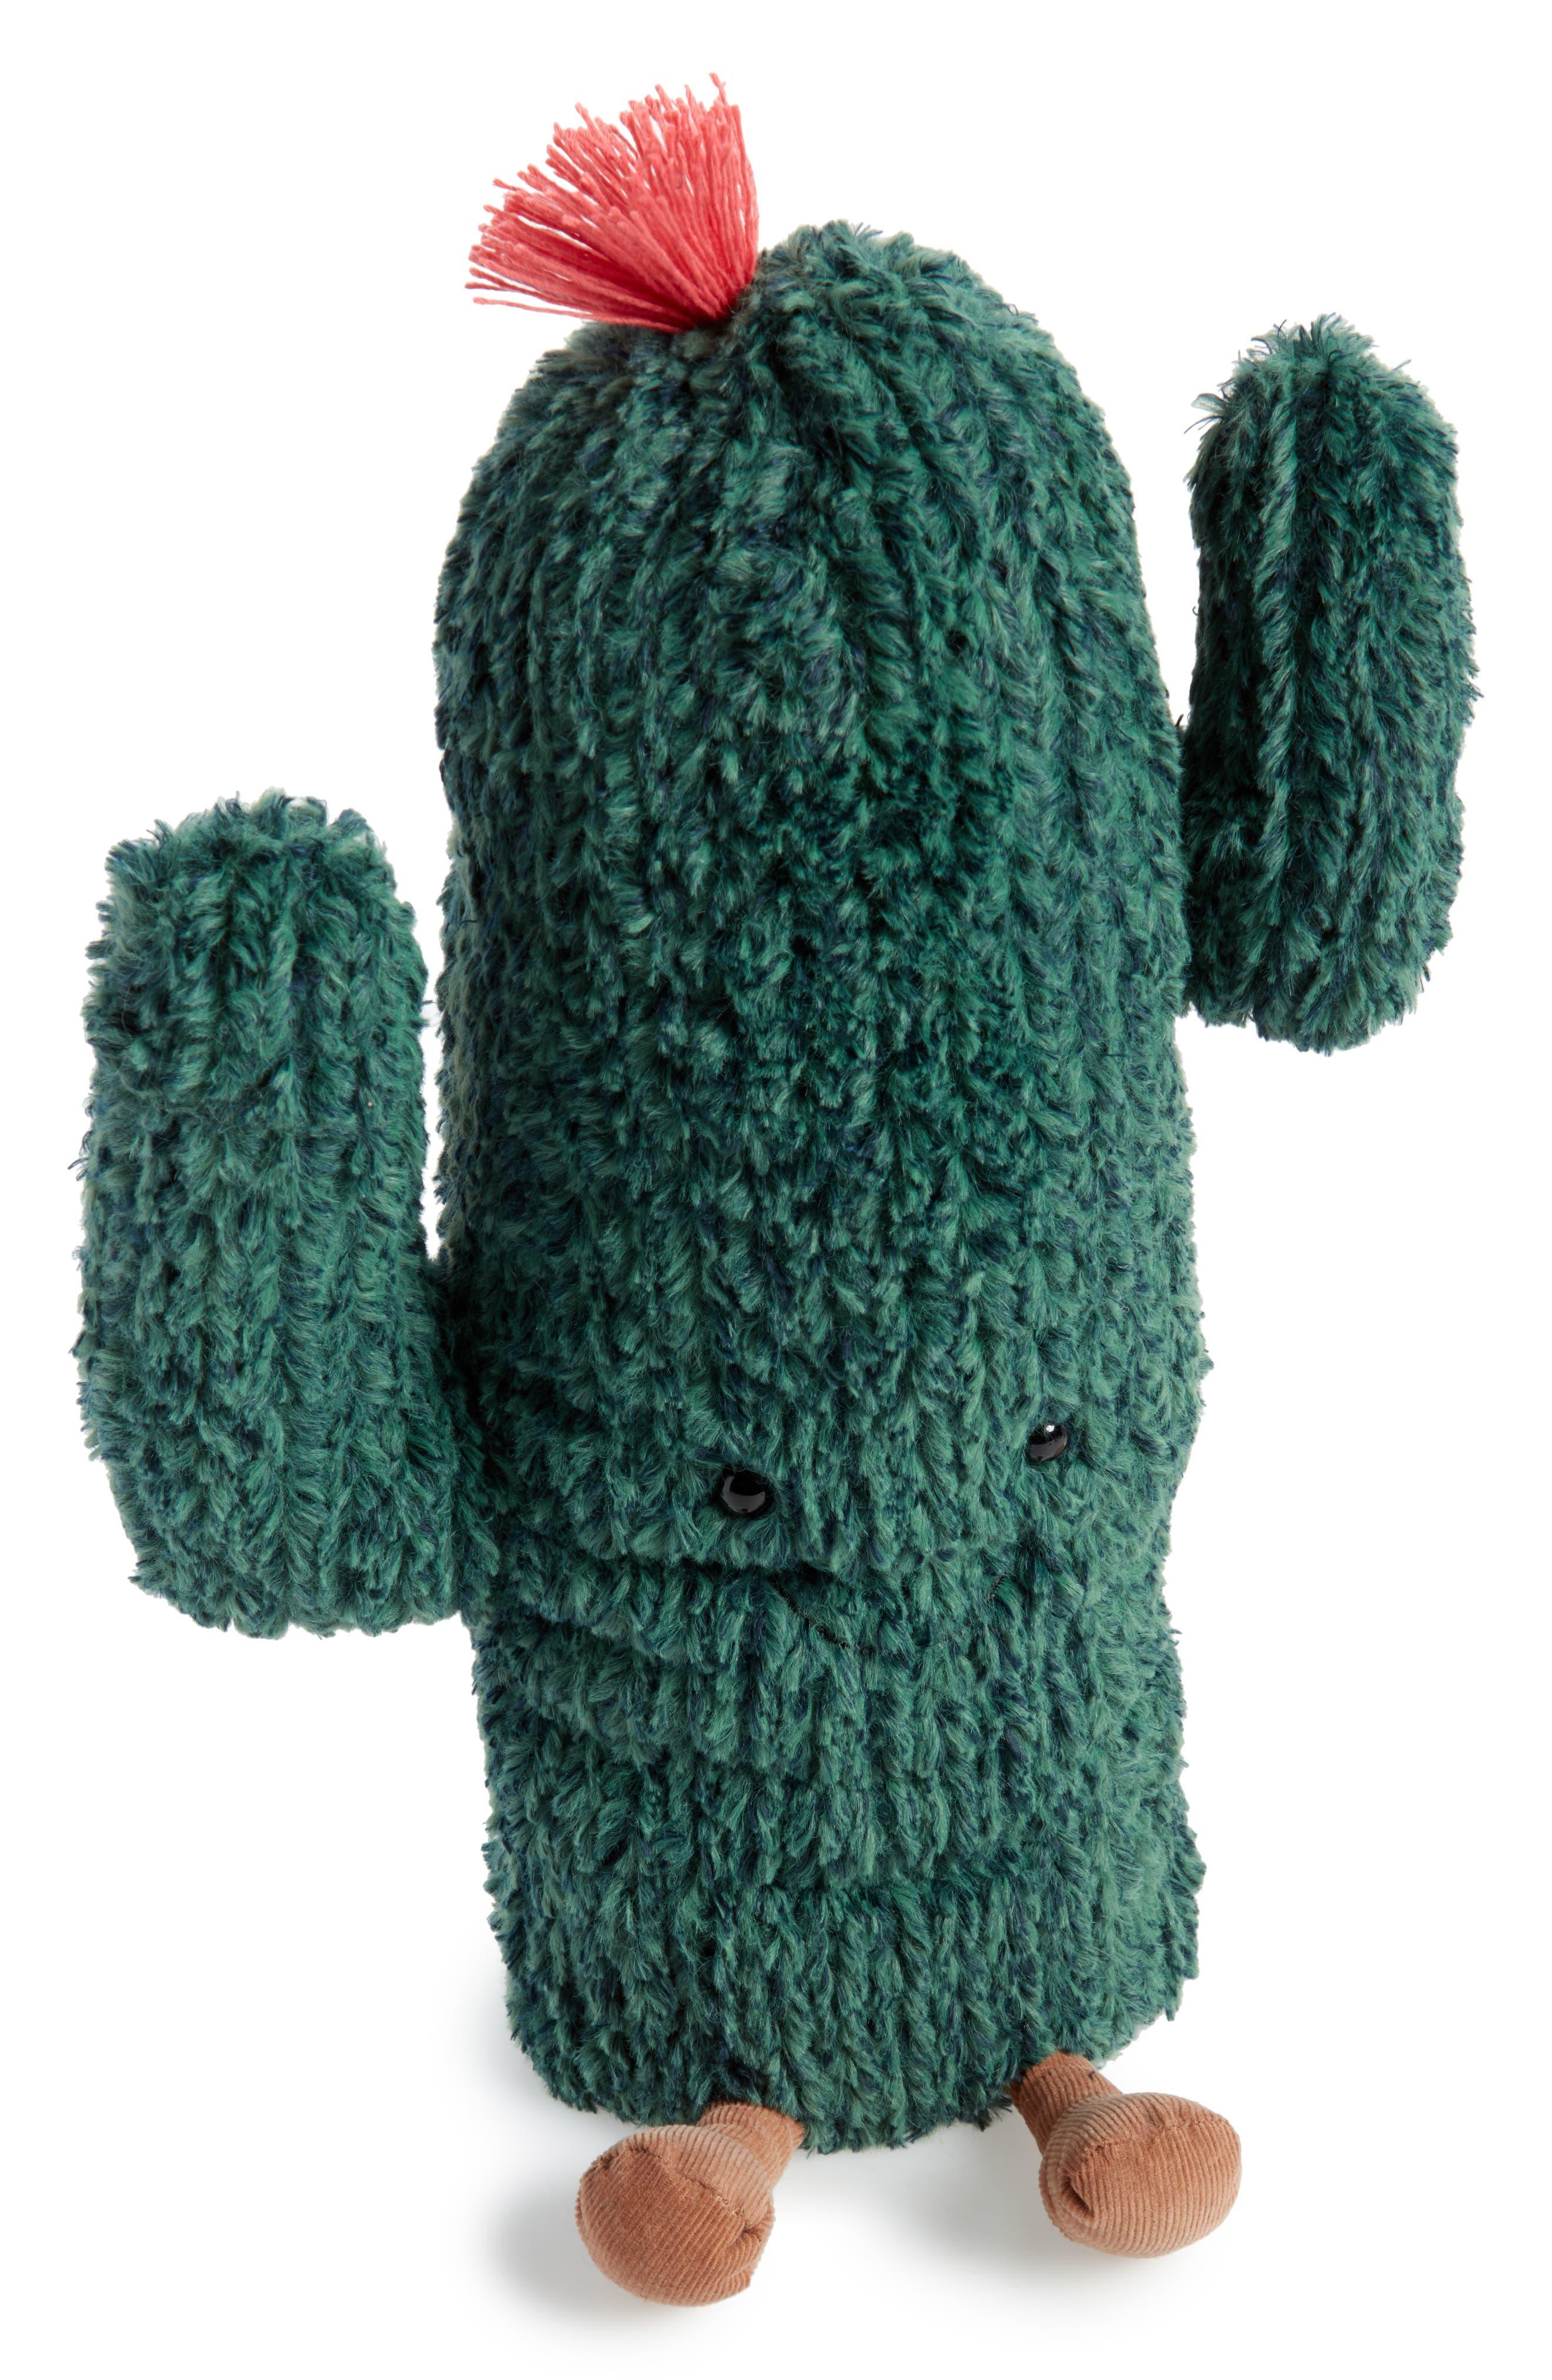 Amuseable Cactus Stuffed Toy,                             Main thumbnail 1, color,                             310